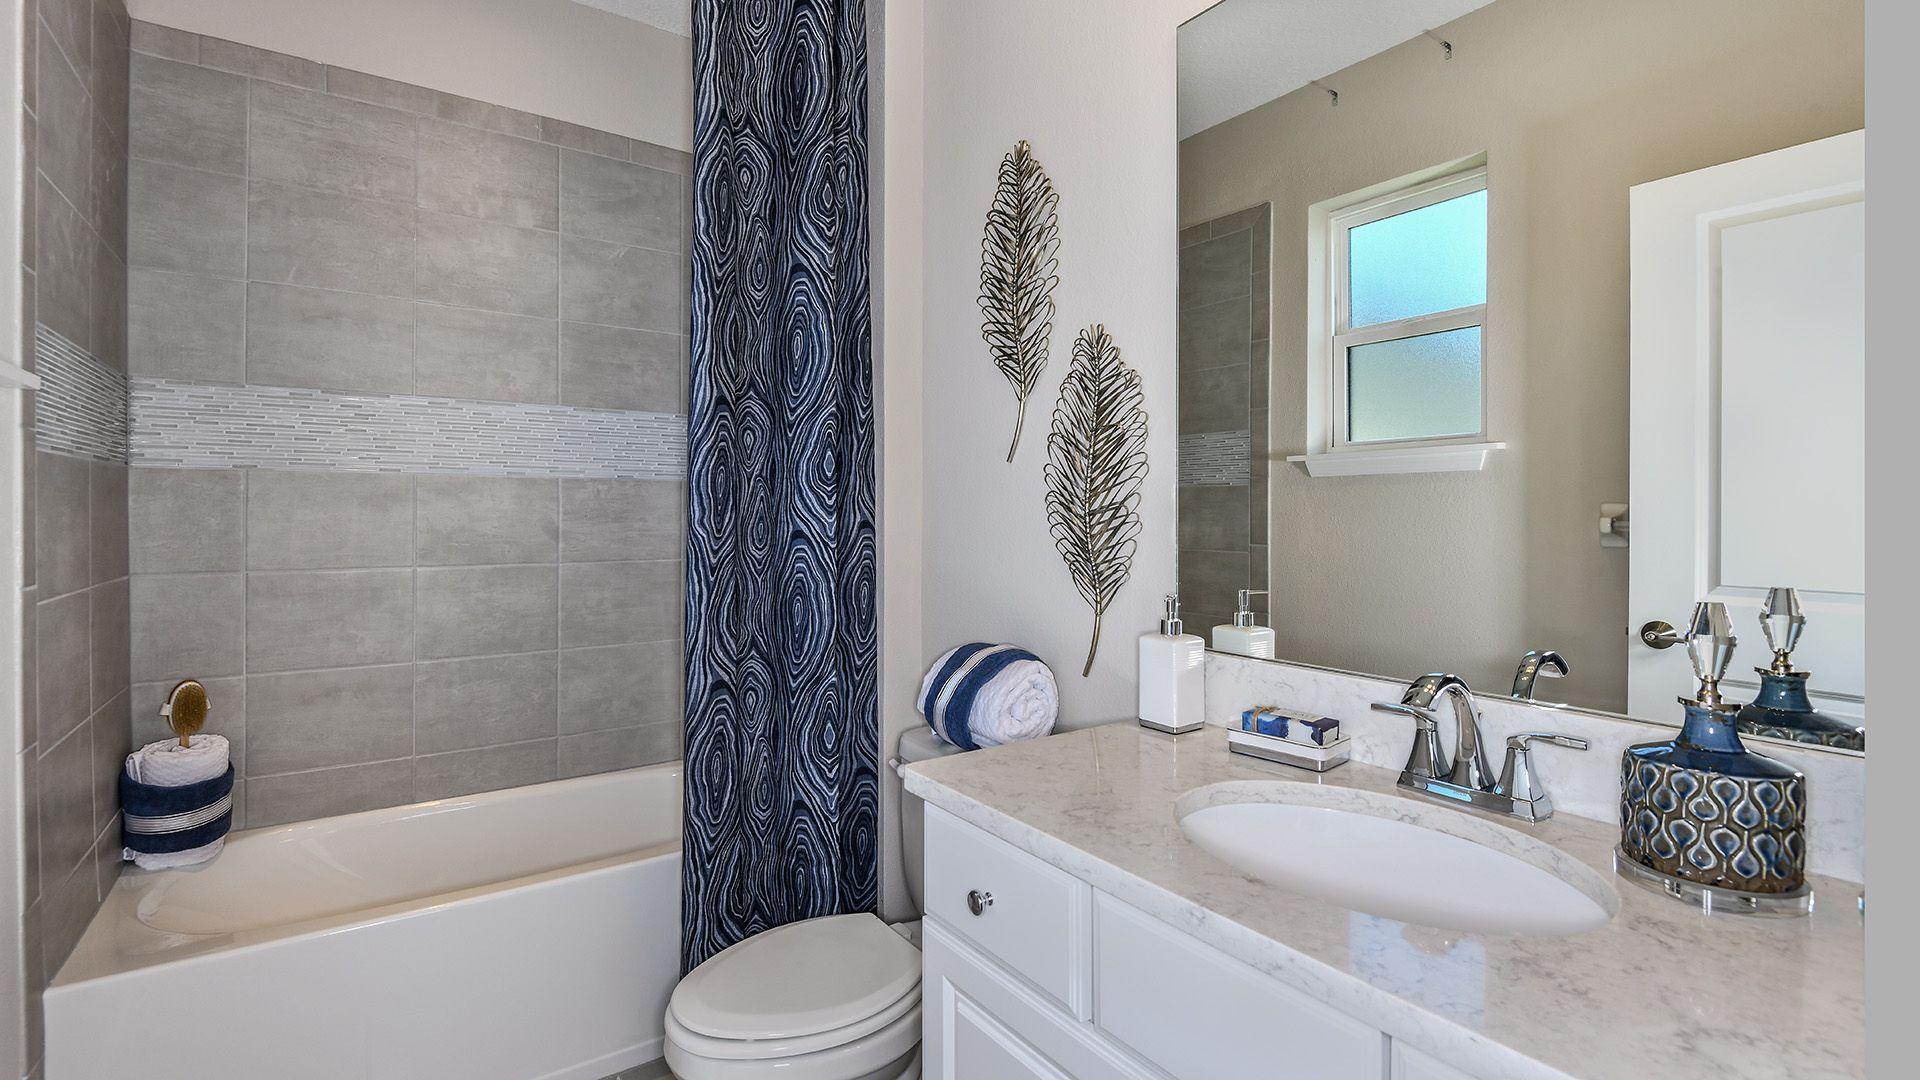 Bathroom featured in the Anastasia By Taylor Morrison in Sarasota-Bradenton, FL